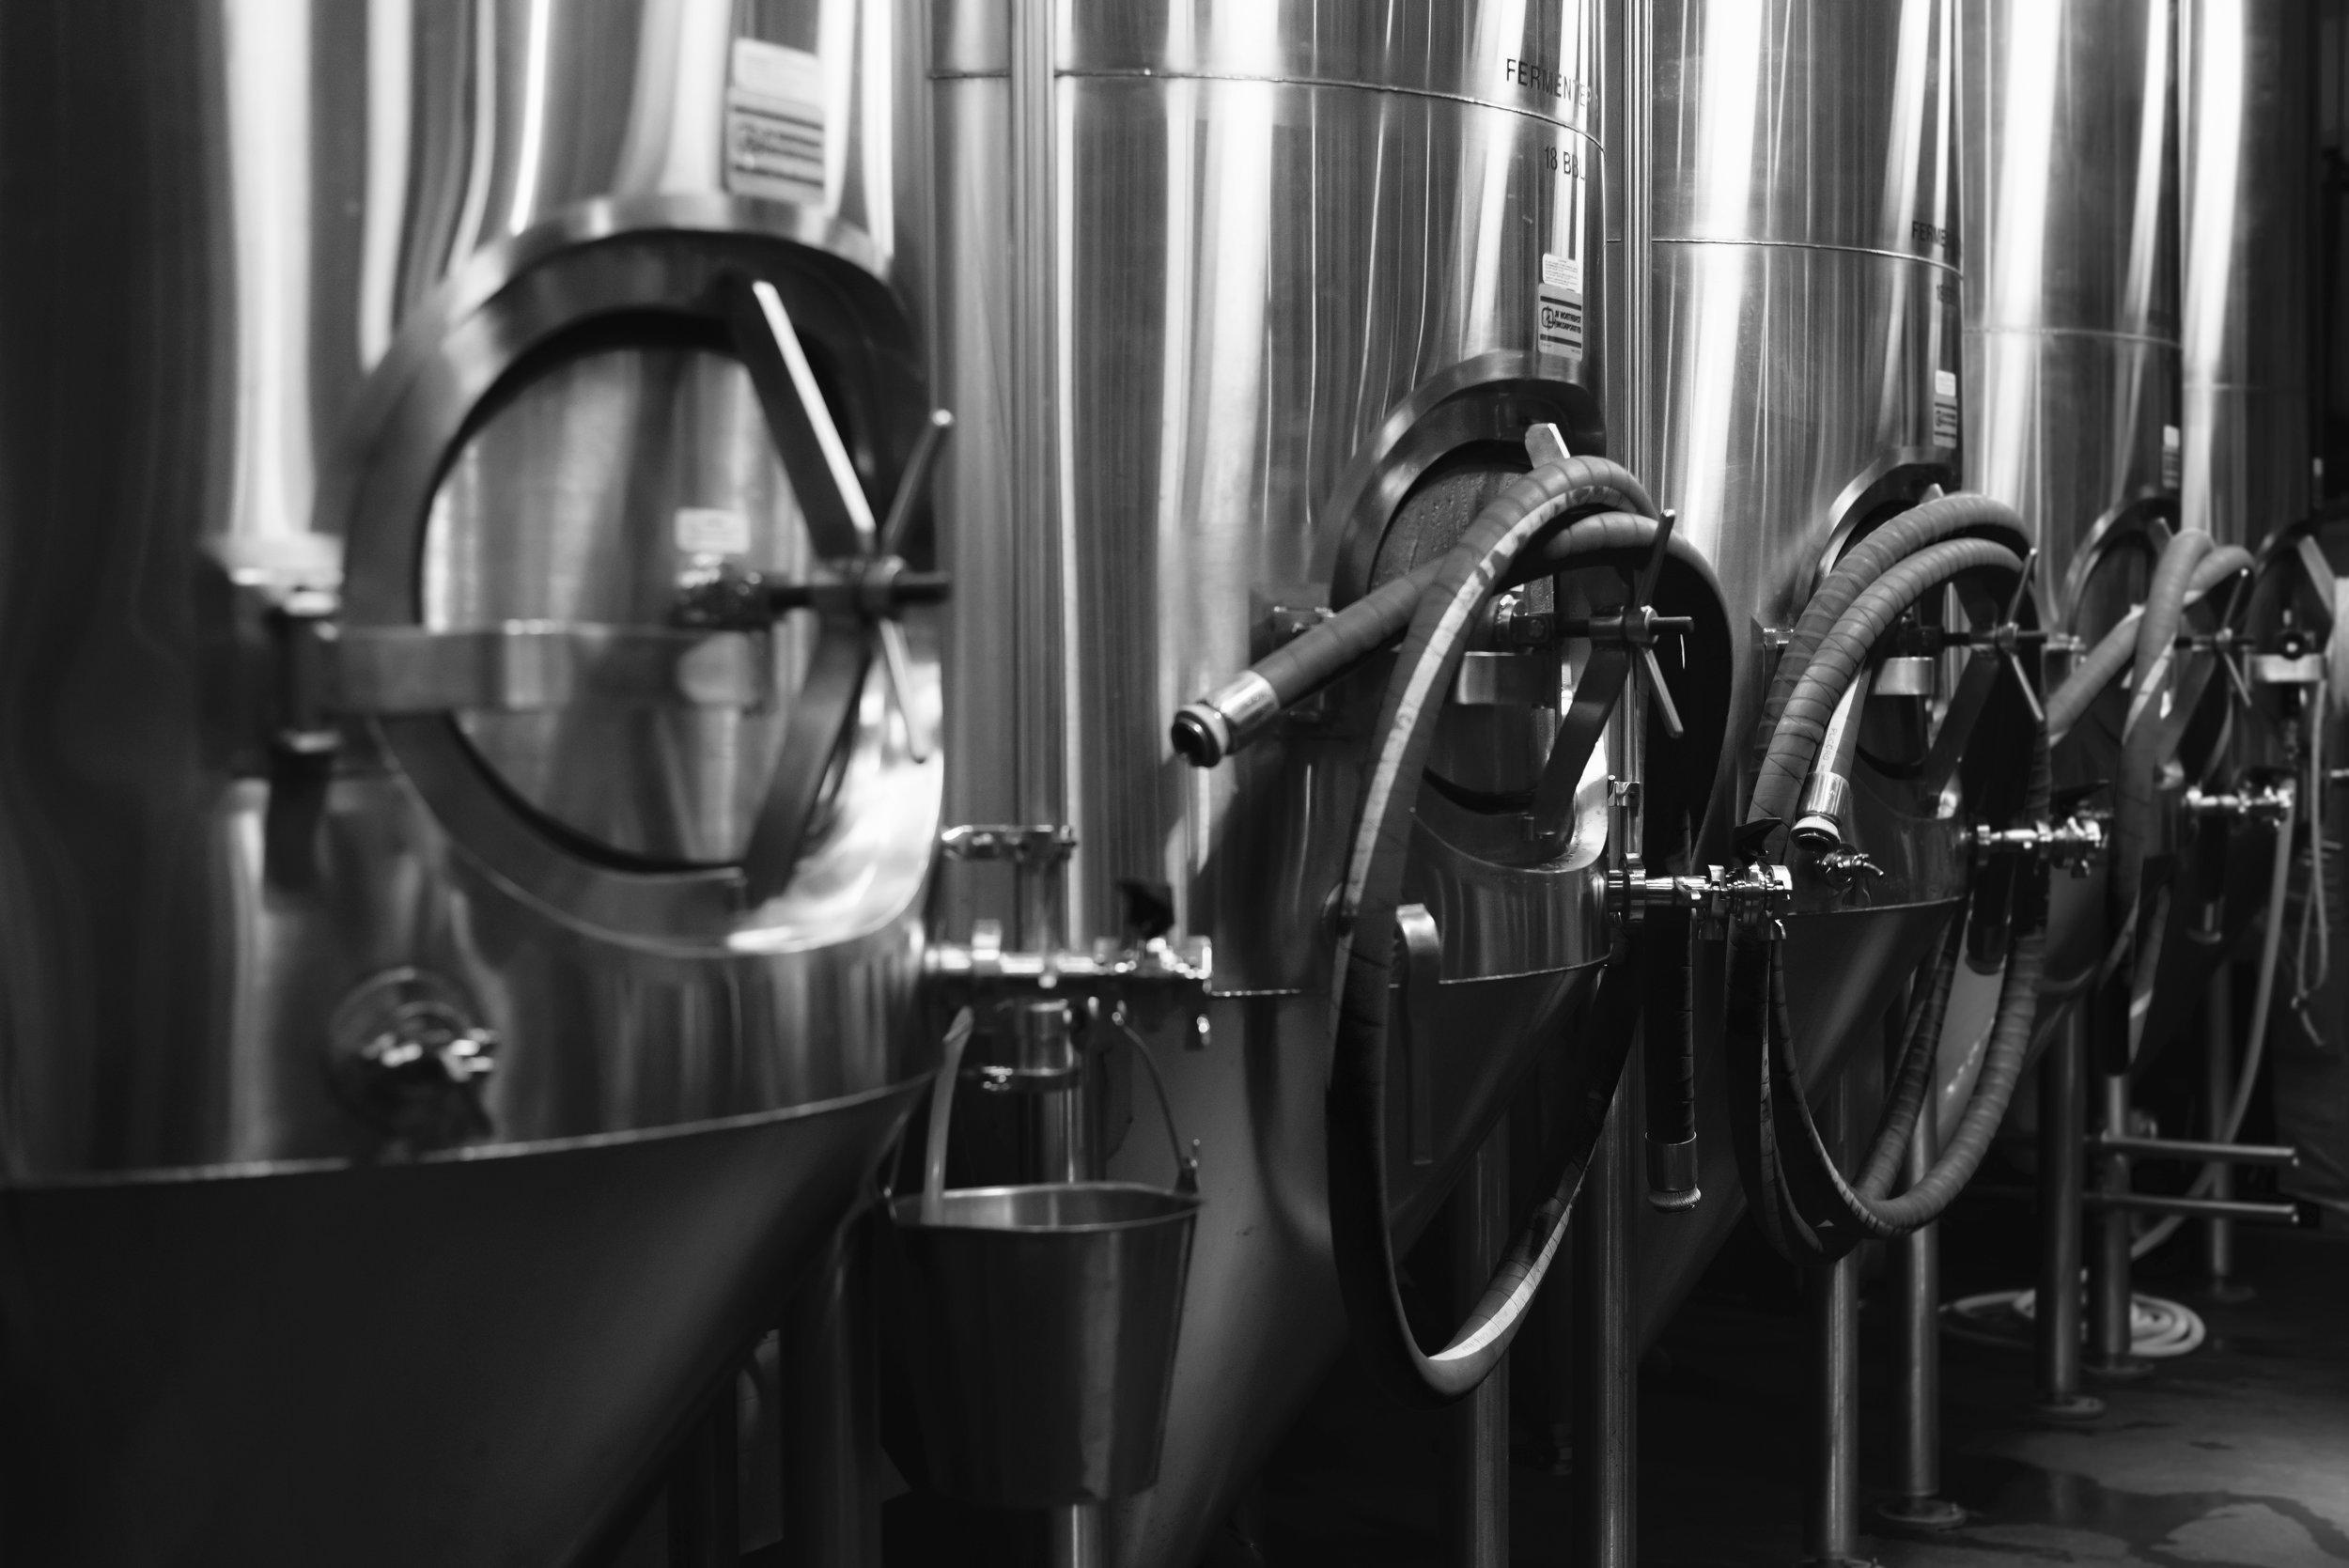 Tanks at a Brewery